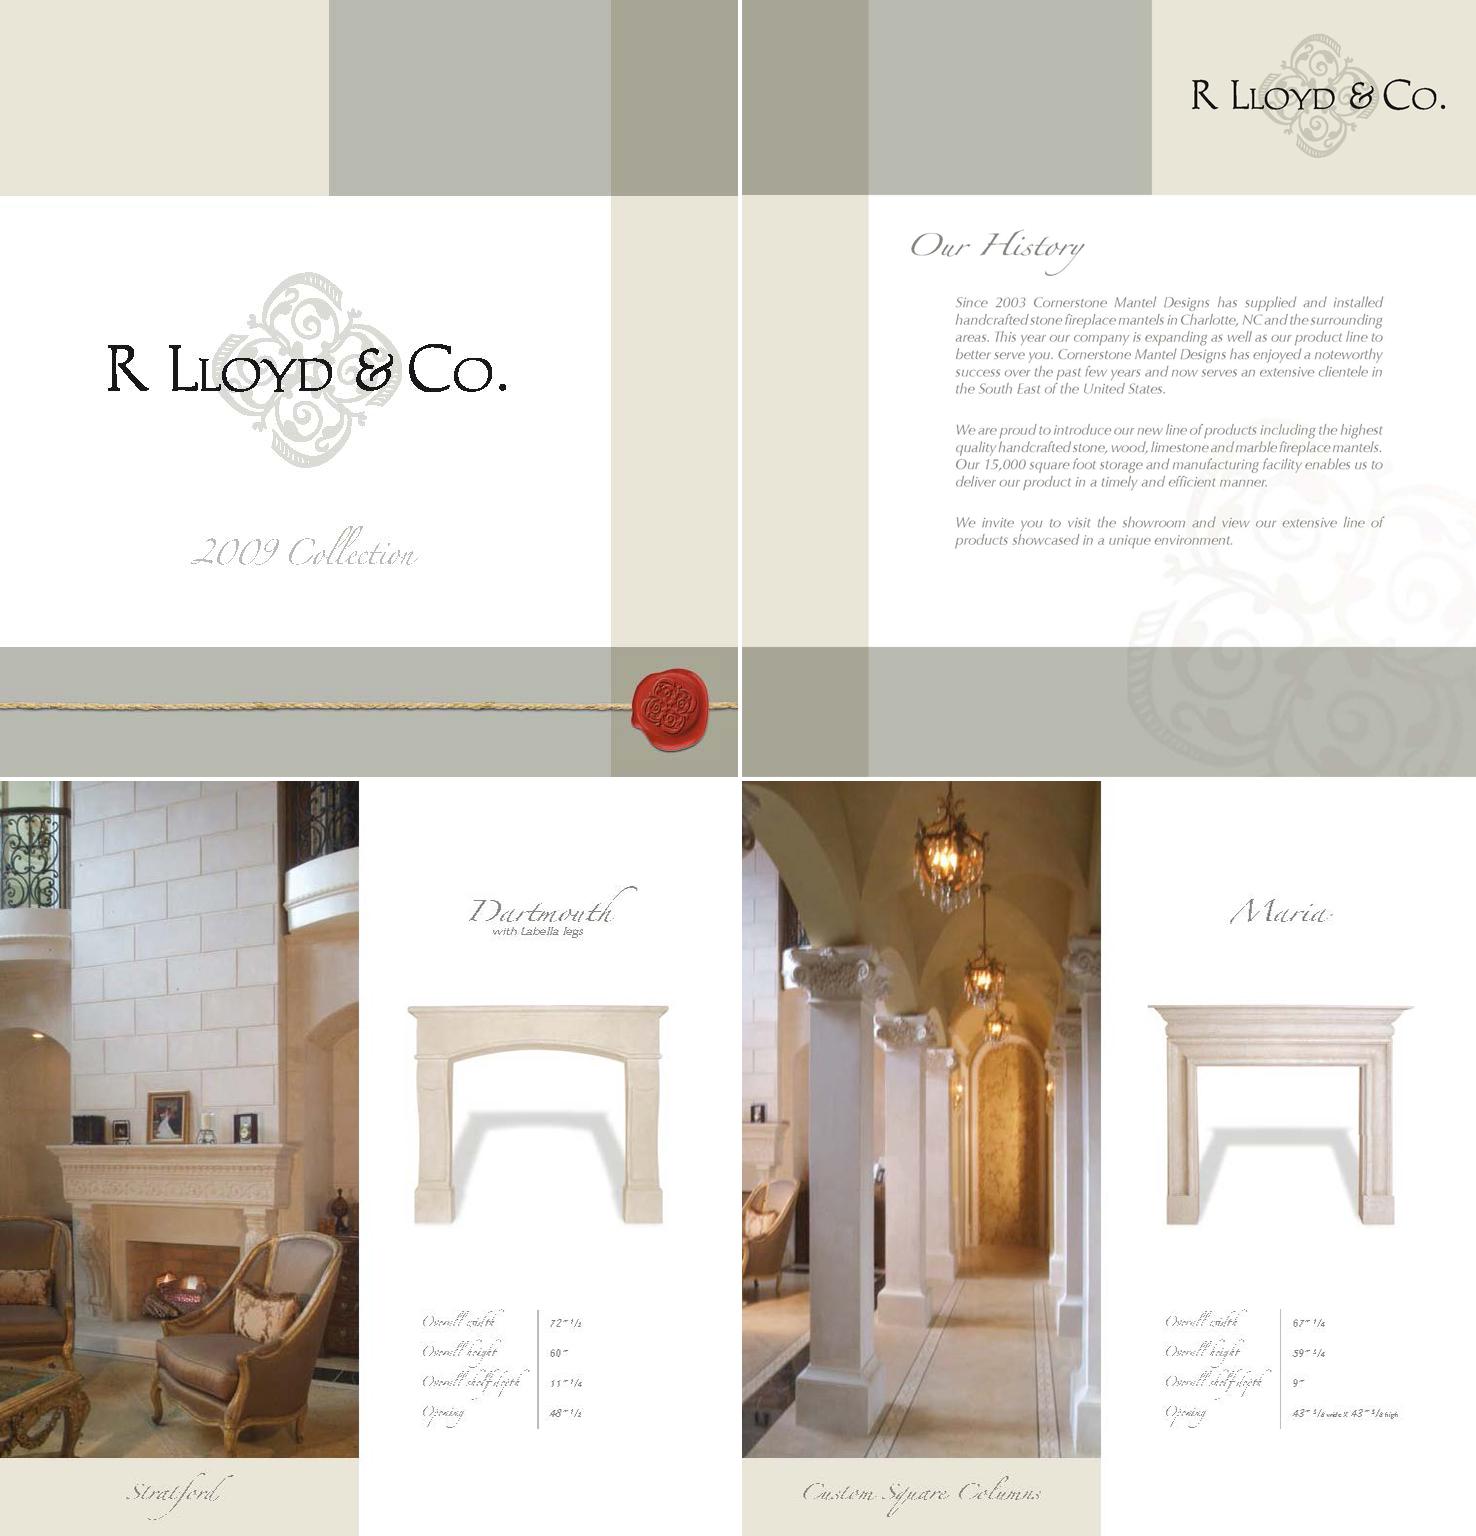 R Lloyd & Co Brochure.jpg